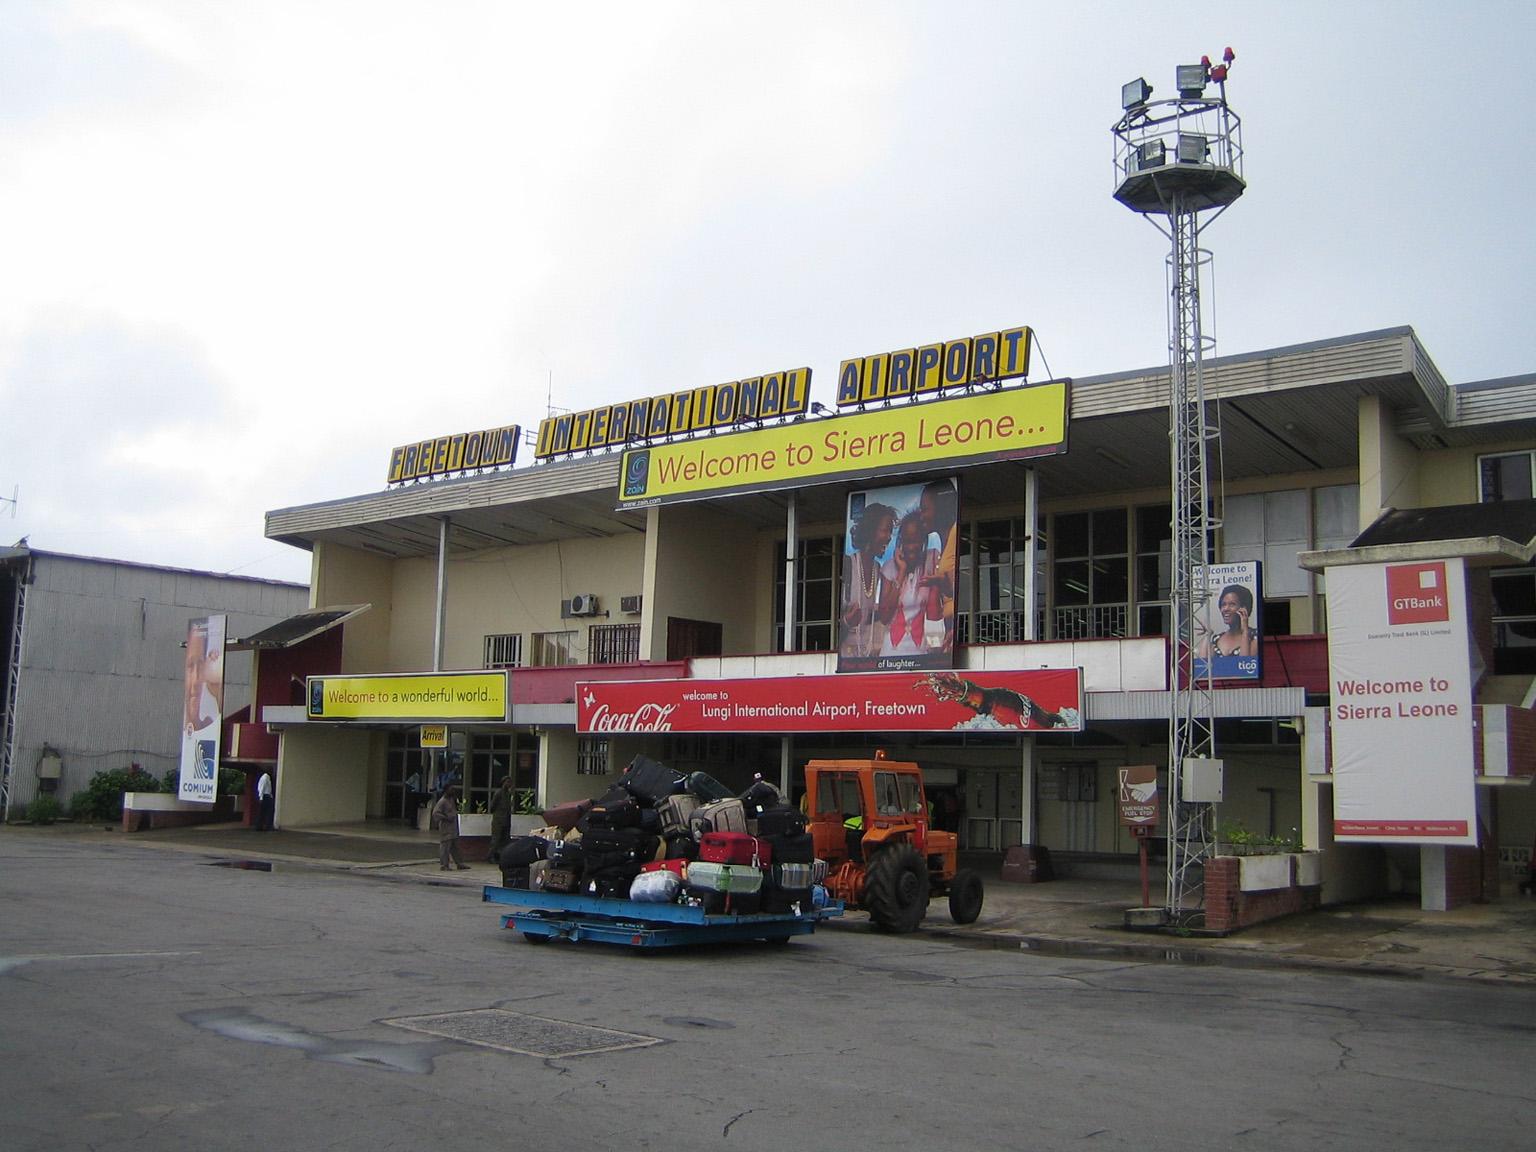 SIERRA LEONA 03